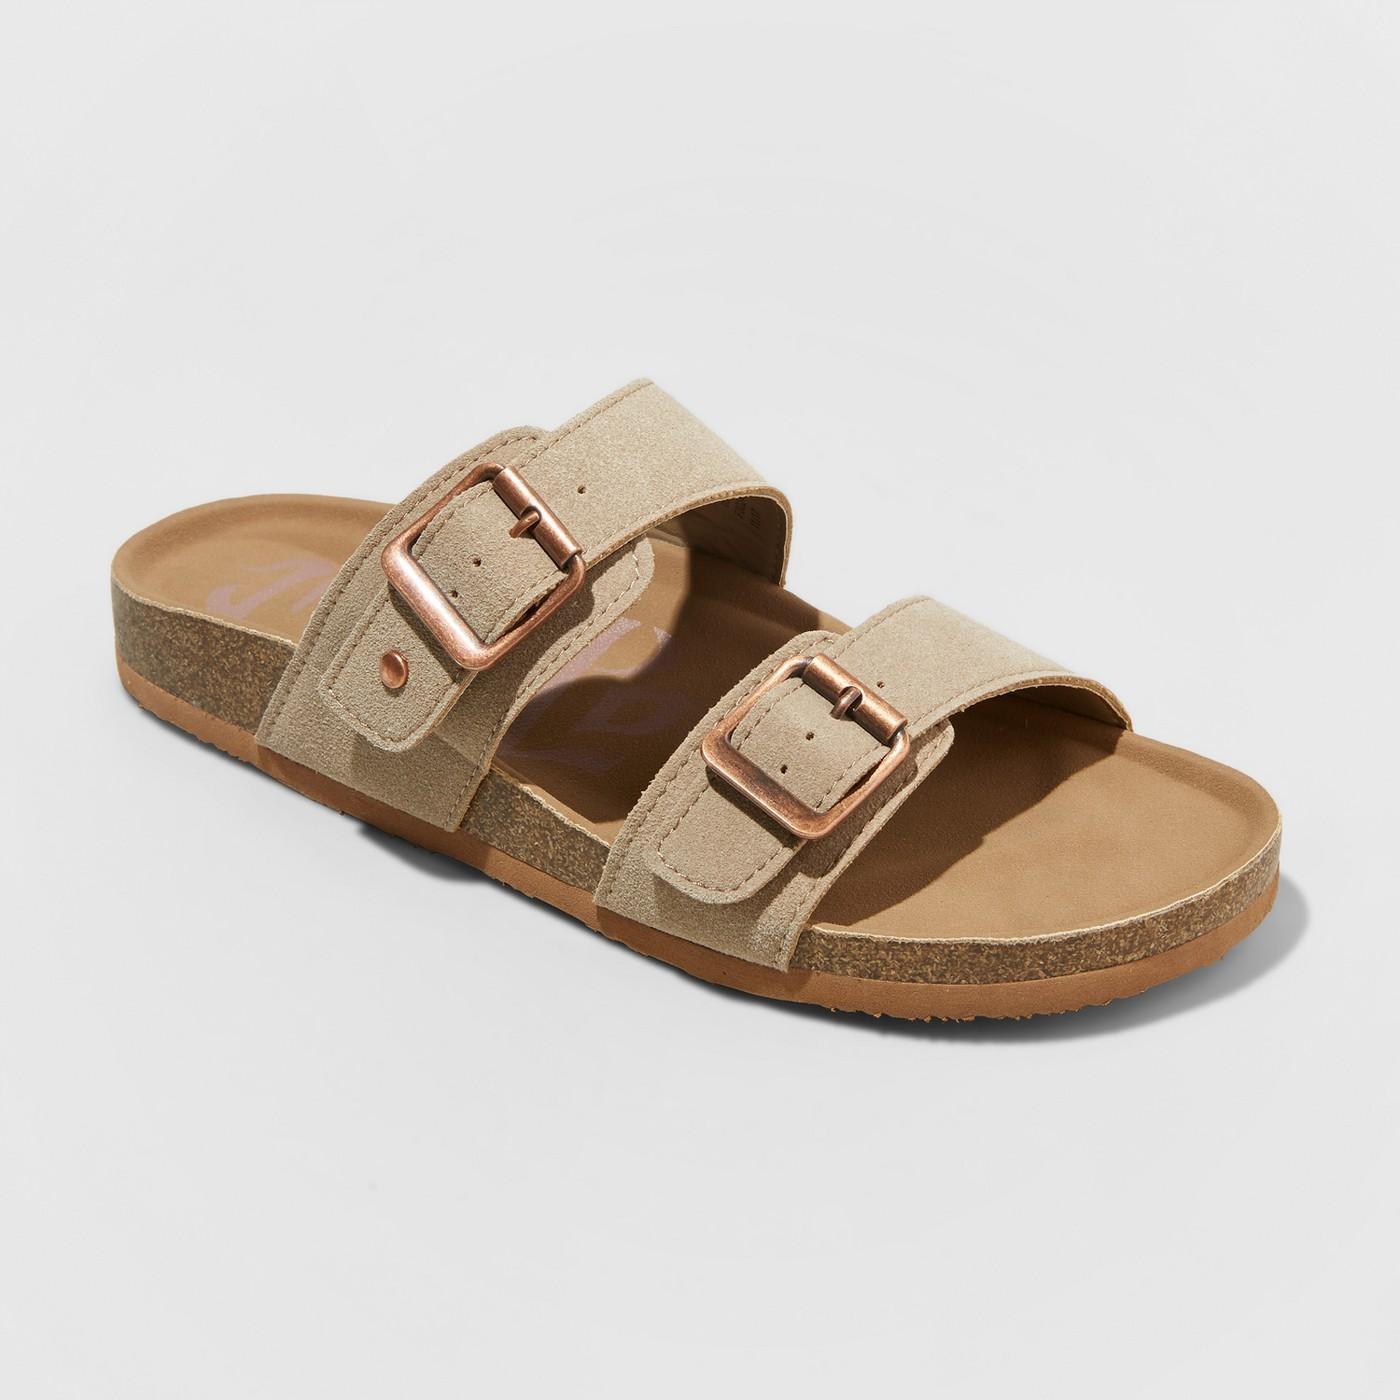 Women's Mad Love Keava Footbed Sandal - image 1 of 3